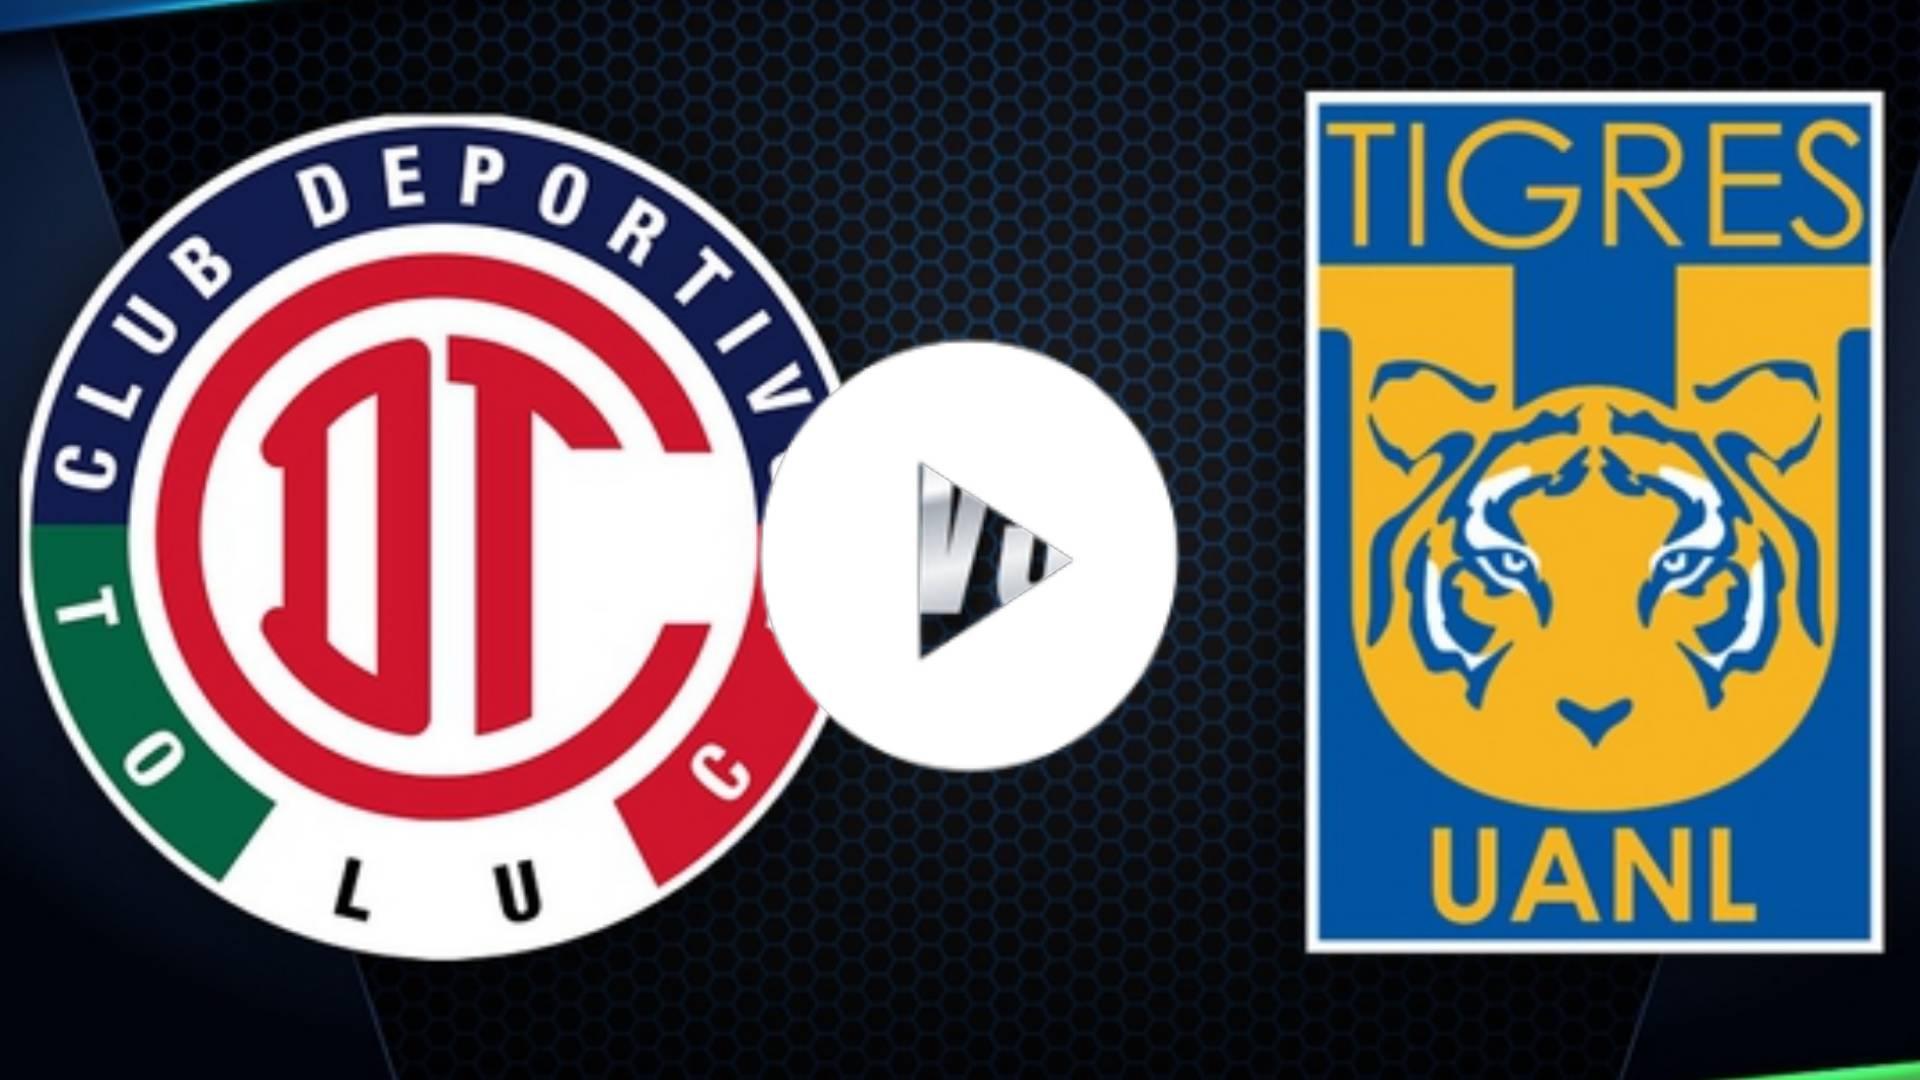 LIGA MX EN VIVO: Tigres UANL vs Toluca EN VIVO ONLINE, Hora Y Donde Ver | Liga MX 2020 EN VIVO